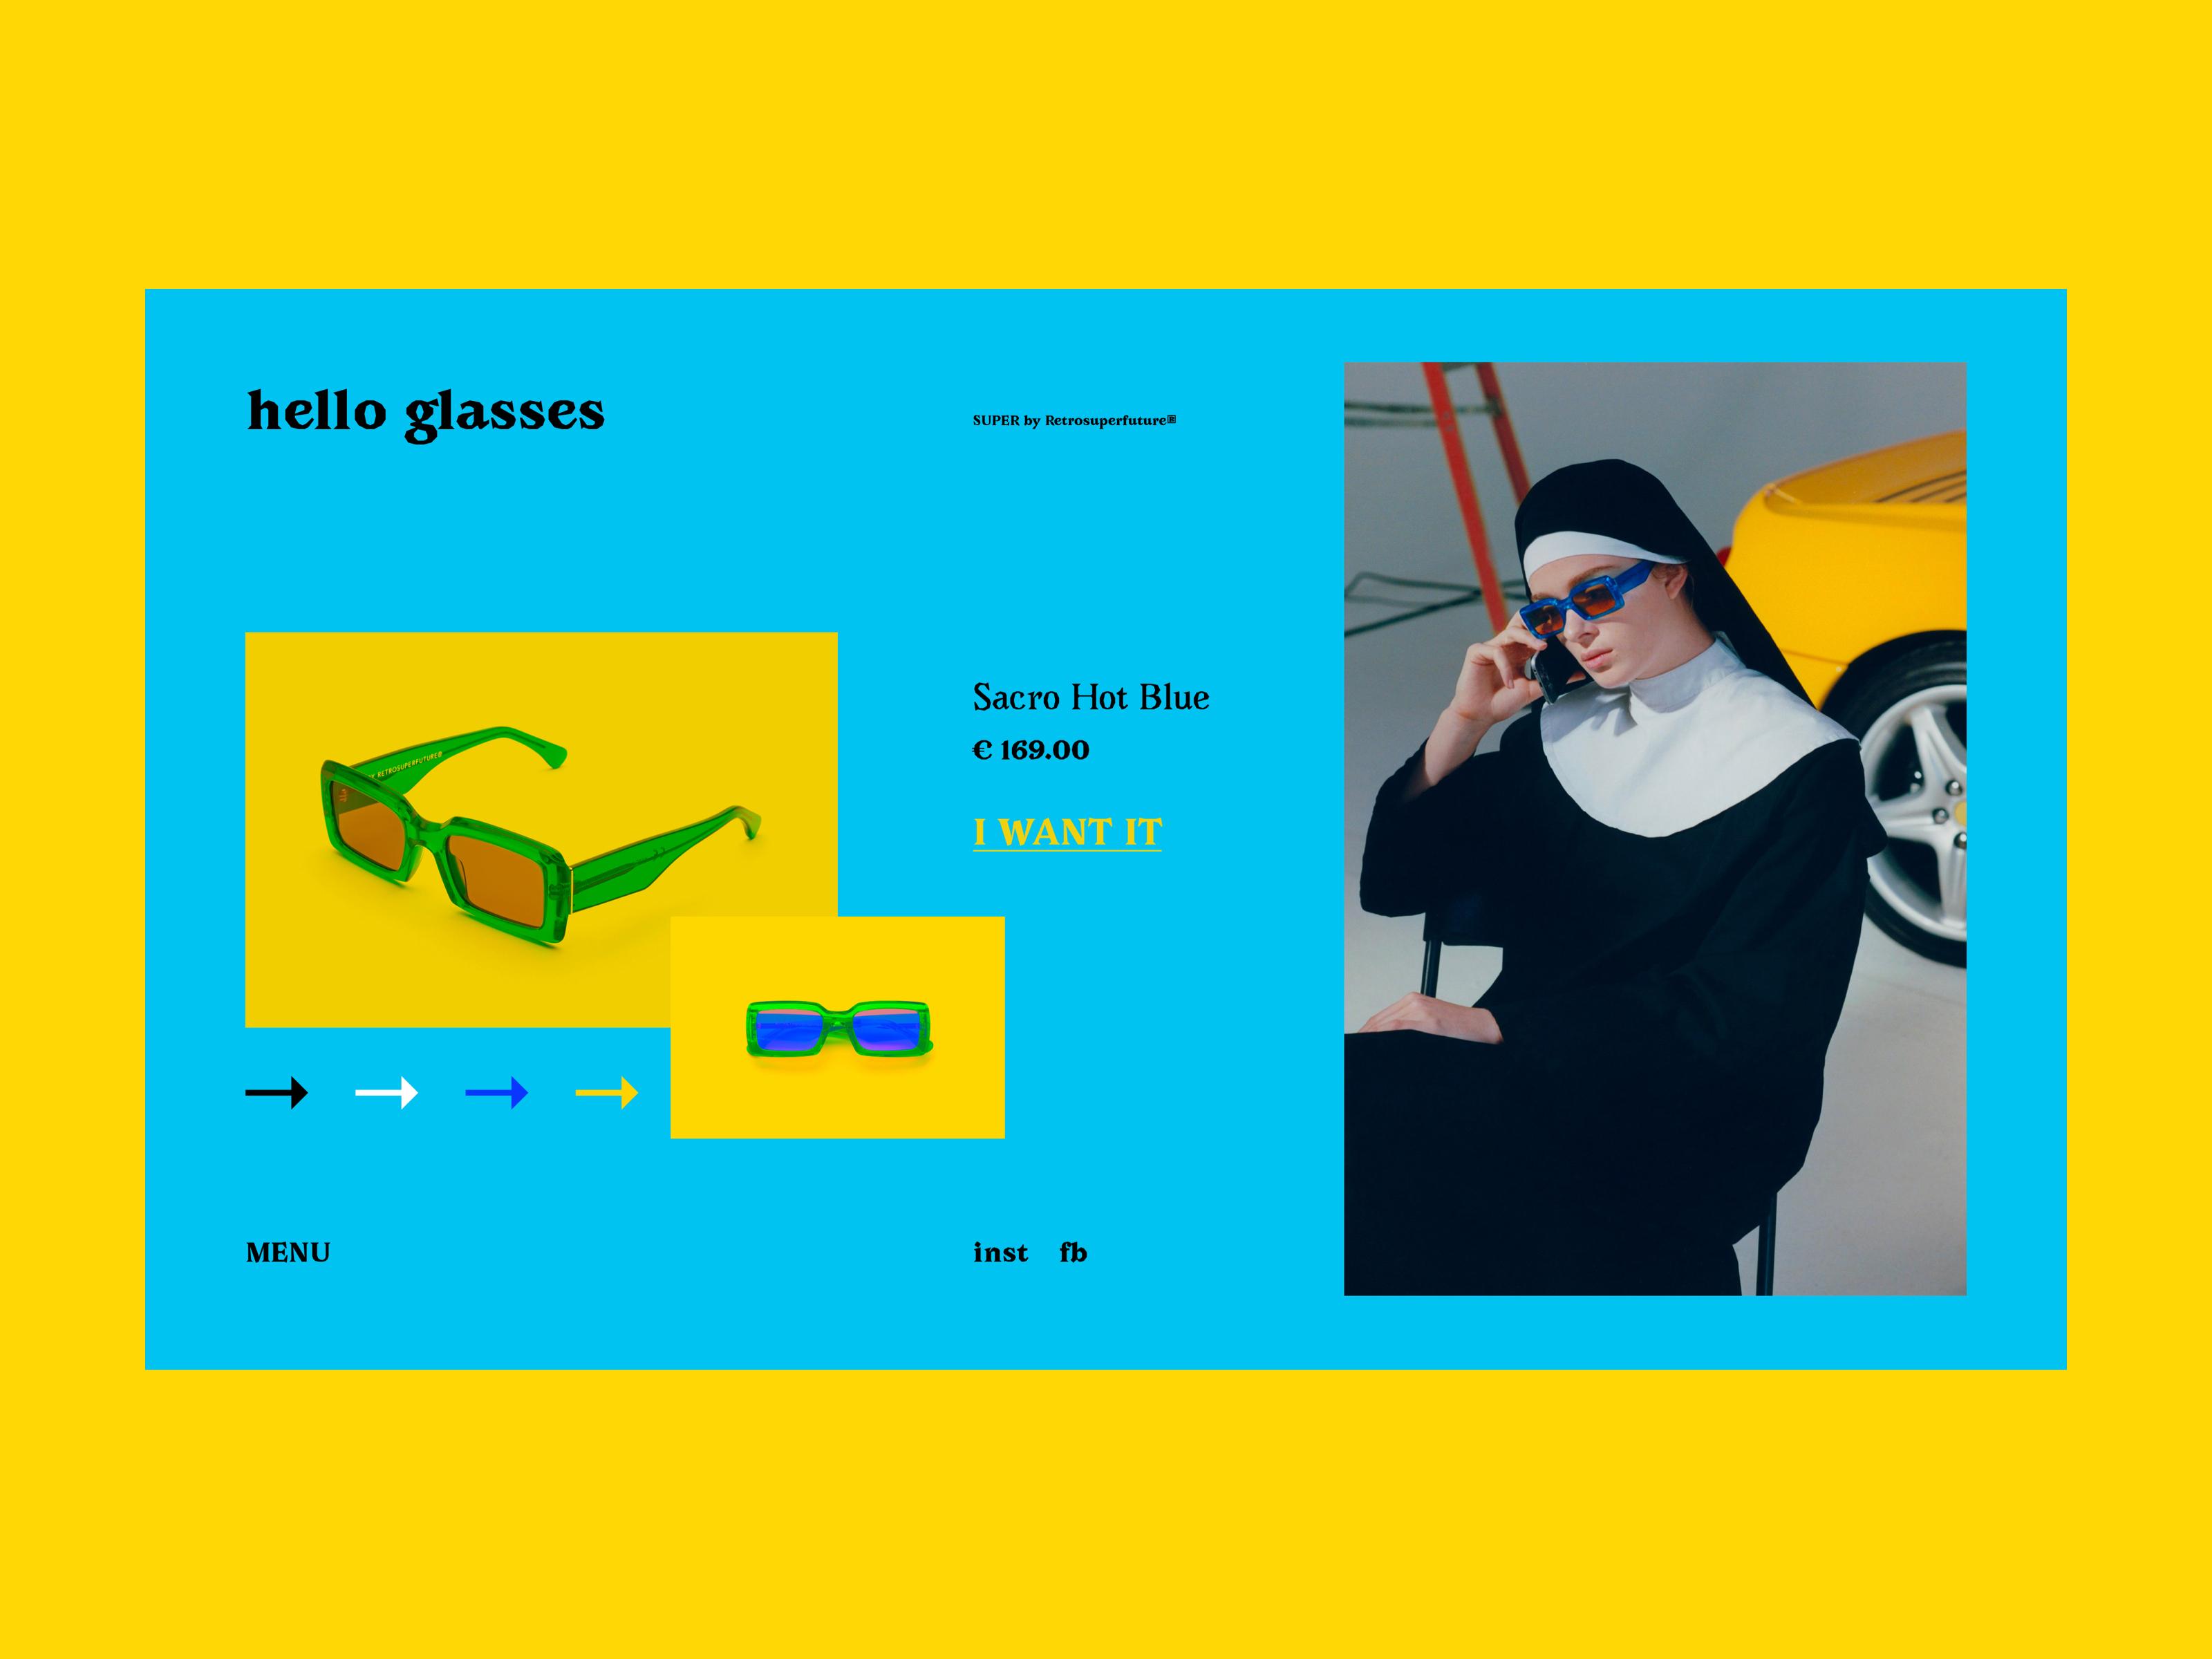 Helloglasses